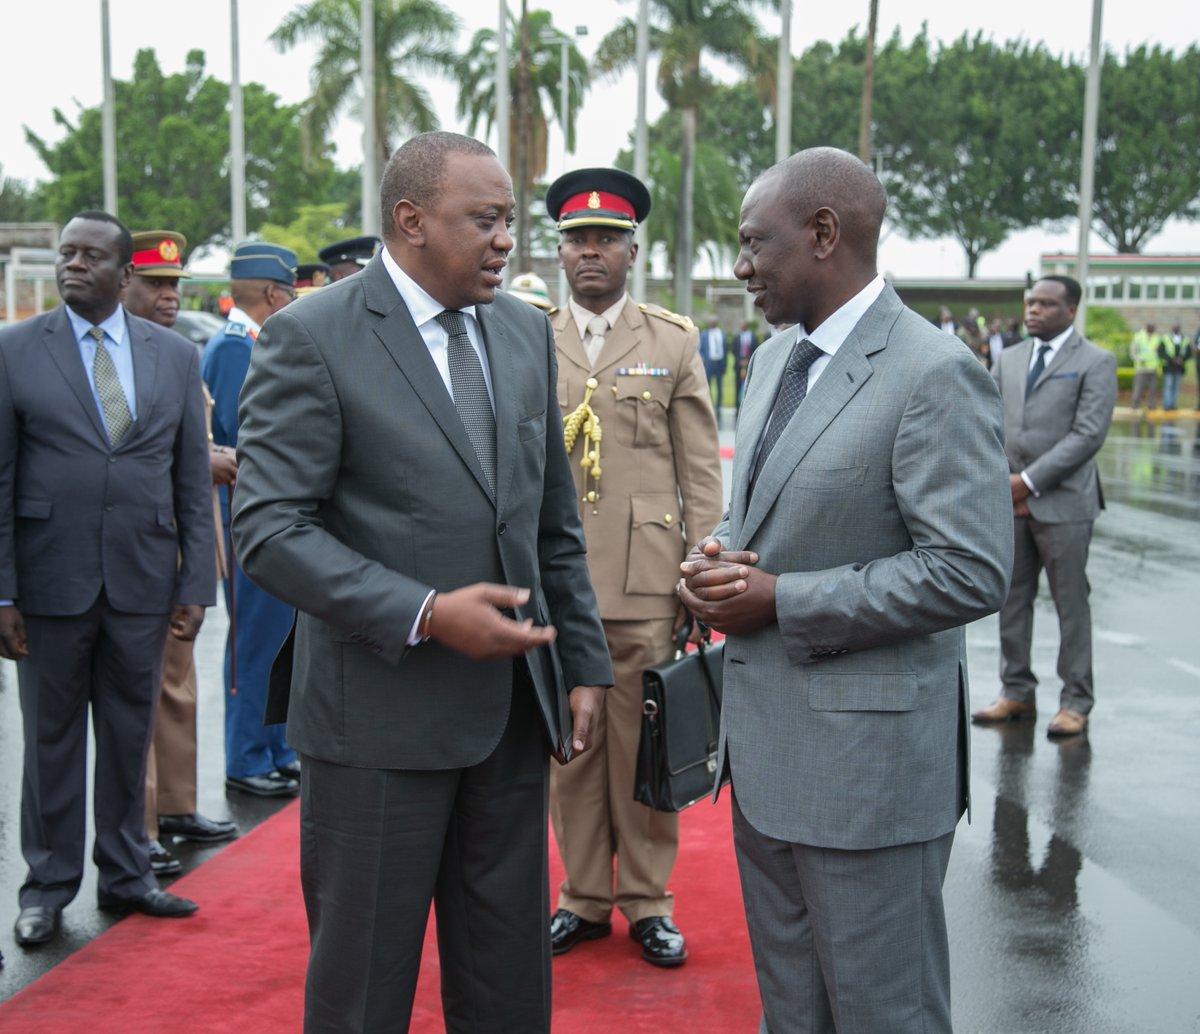 President Uhuru Kenyatta Speech During Opening of 2nd Social Protection Conference